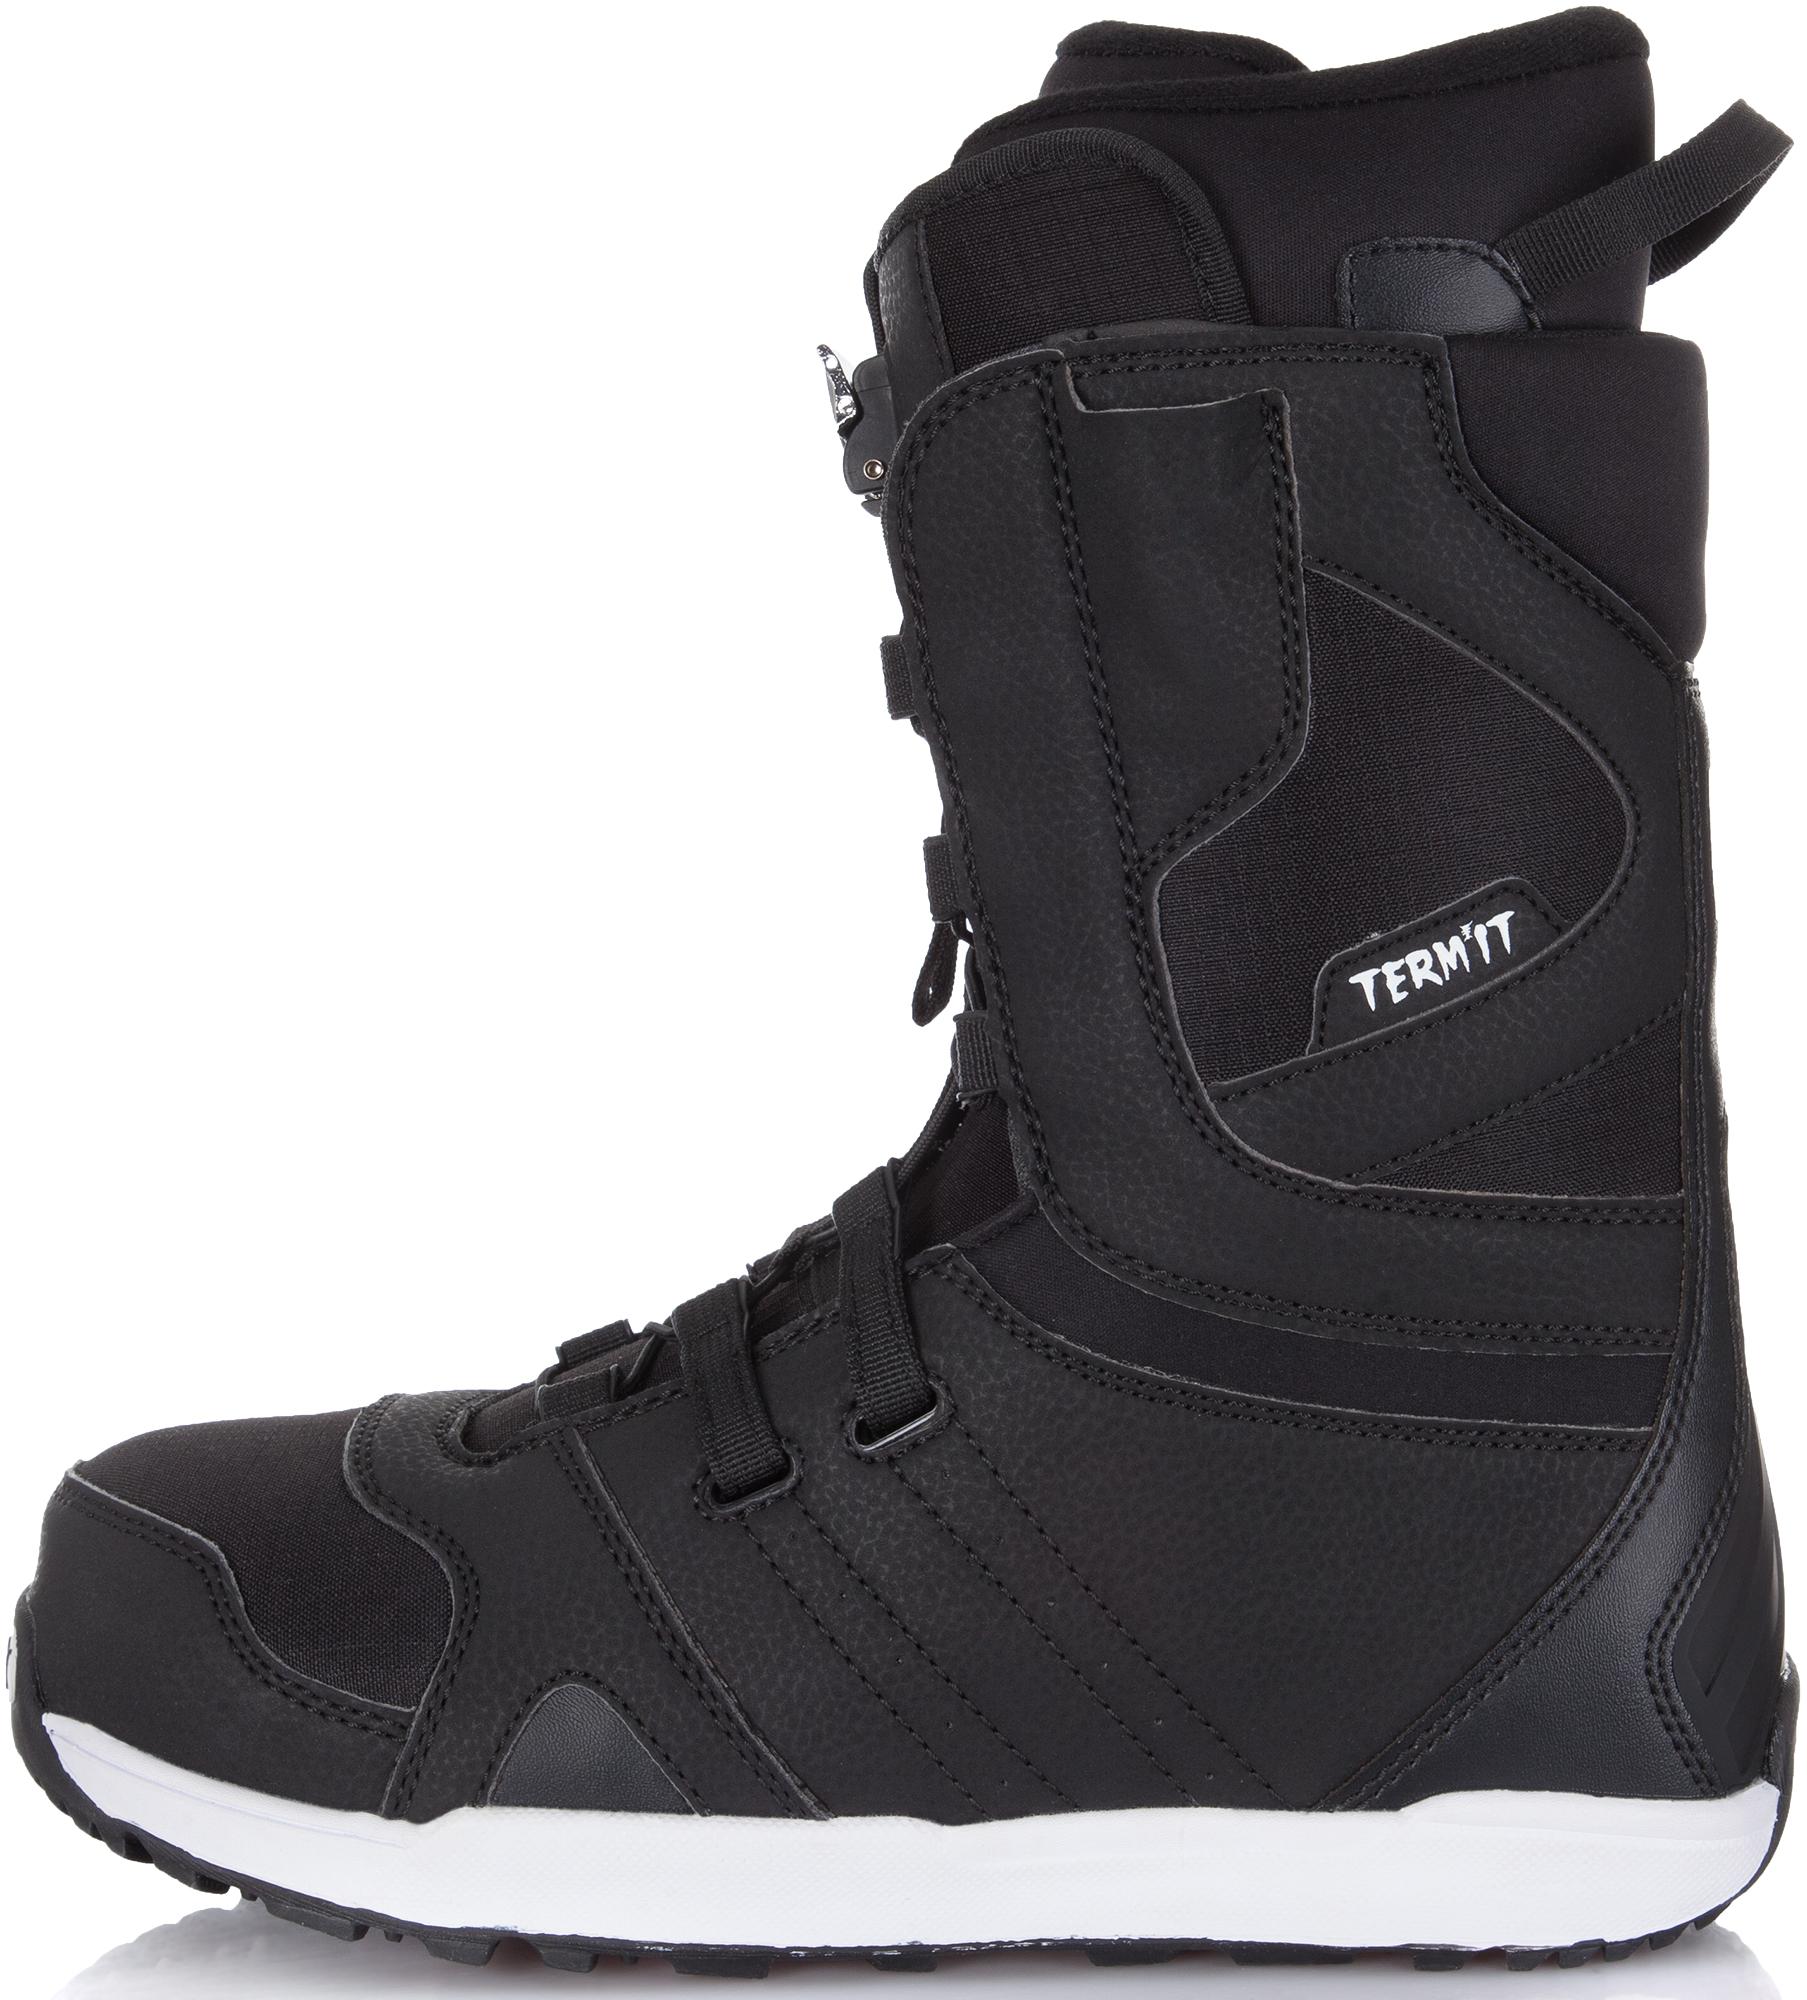 Termit Ботинки сноубордические Termit Trend, размер 43,5